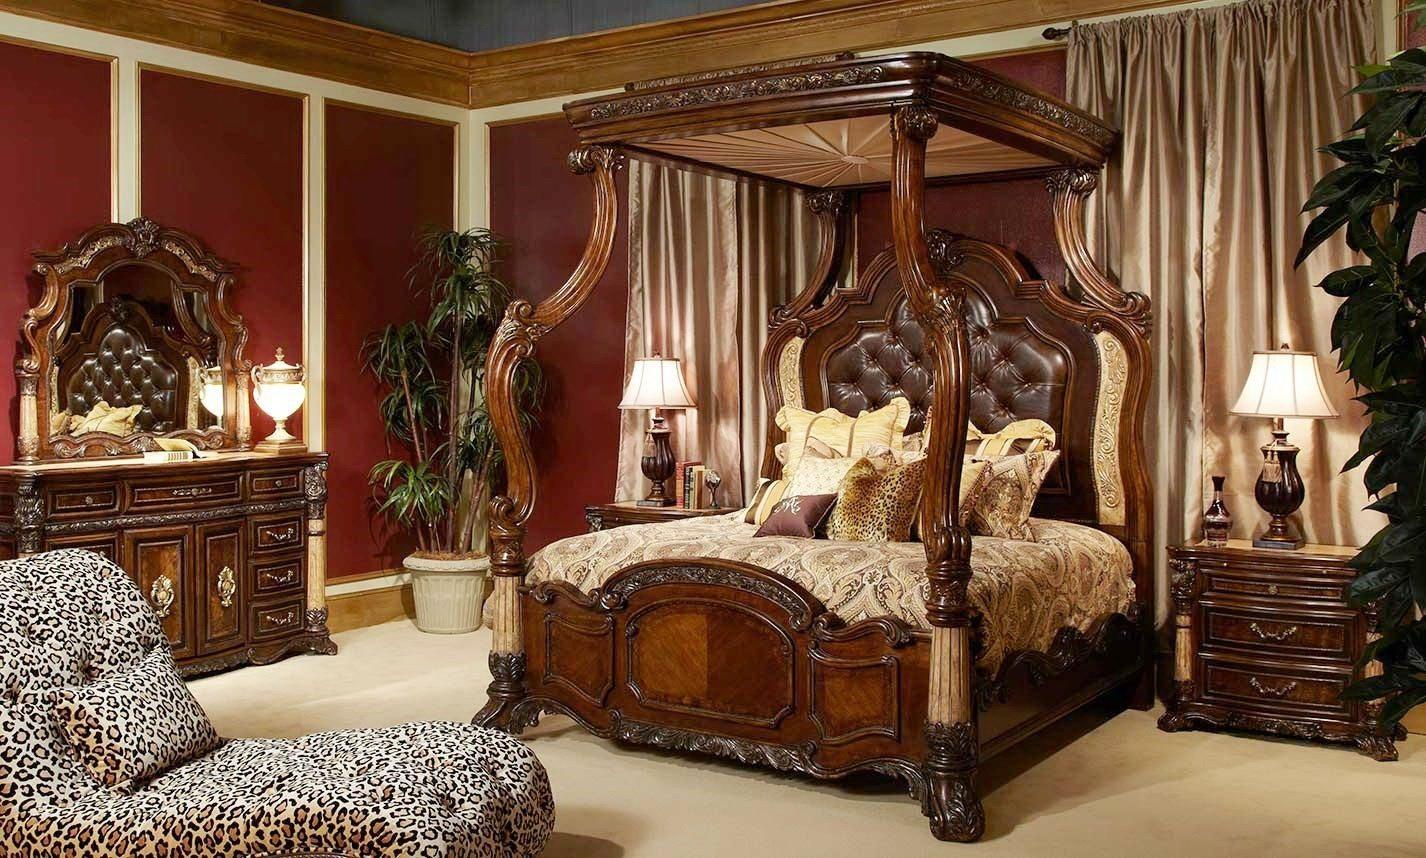 old fashioned bedroom chairs tall bar table and صور غرف نوم كلاسيكية أحدث تصاميم النوم 2017  مجلتك